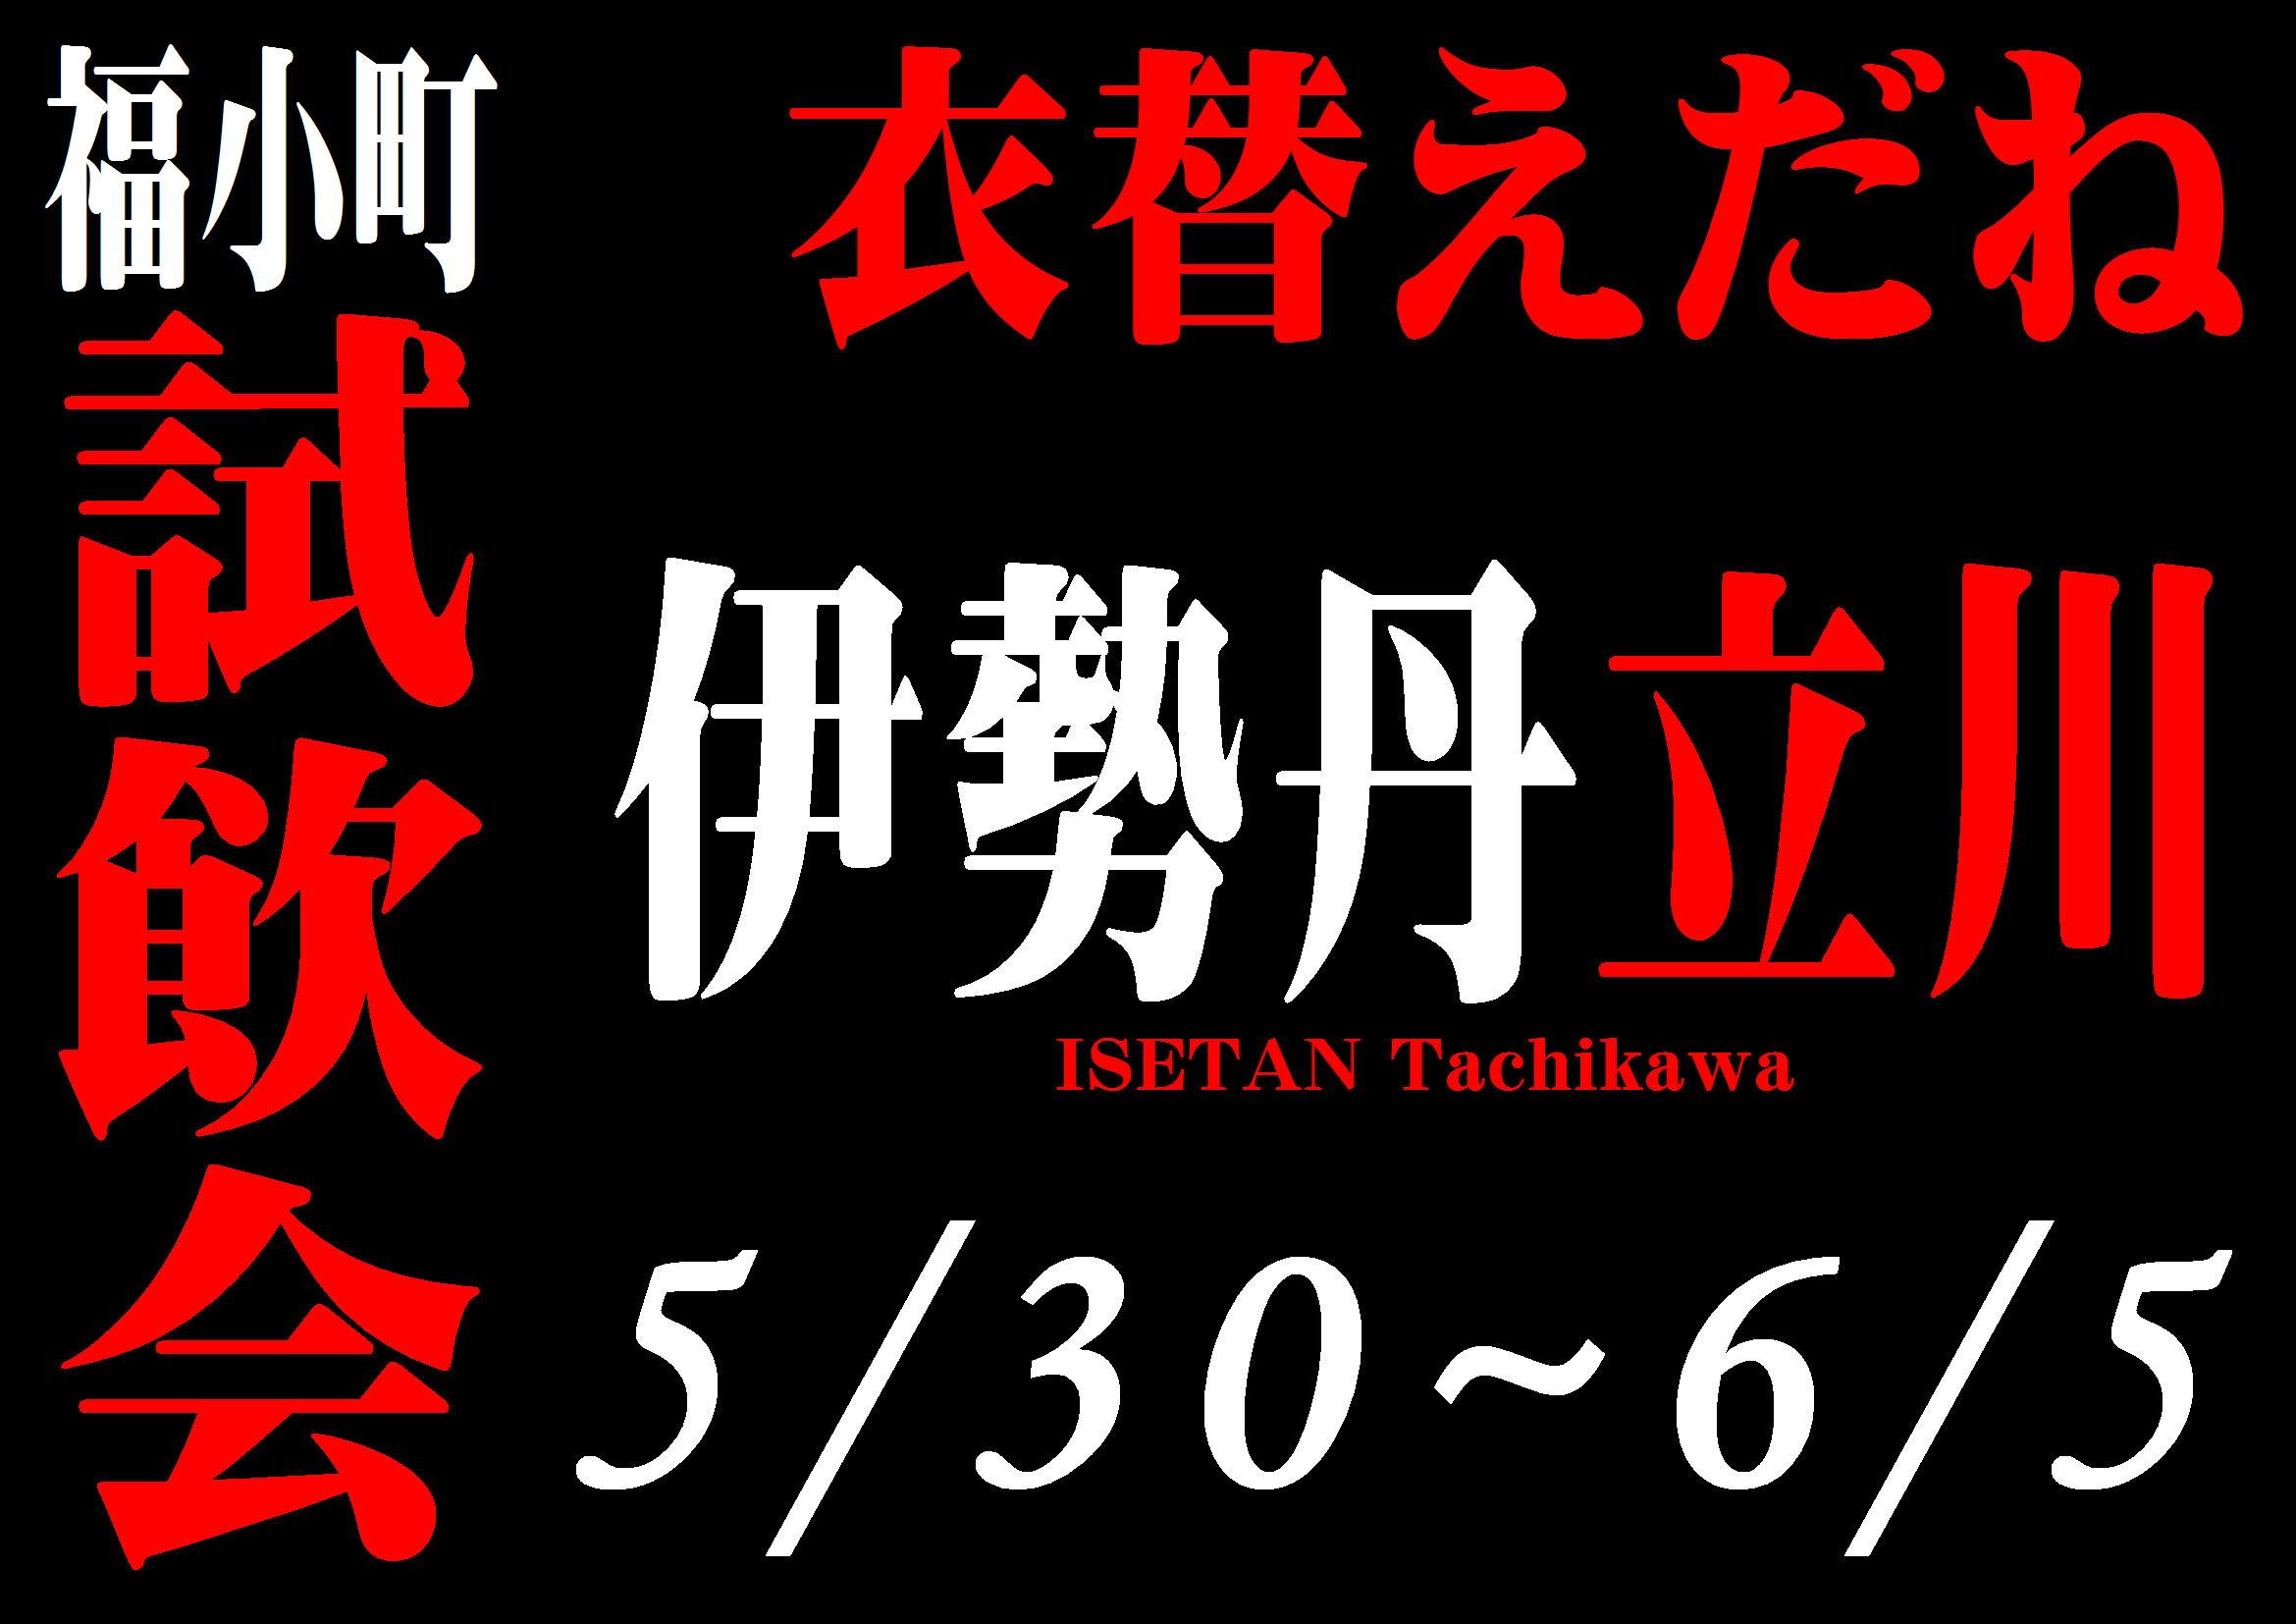 http://www.fukukomachi.com/blog/photo/20180530-2.JPG